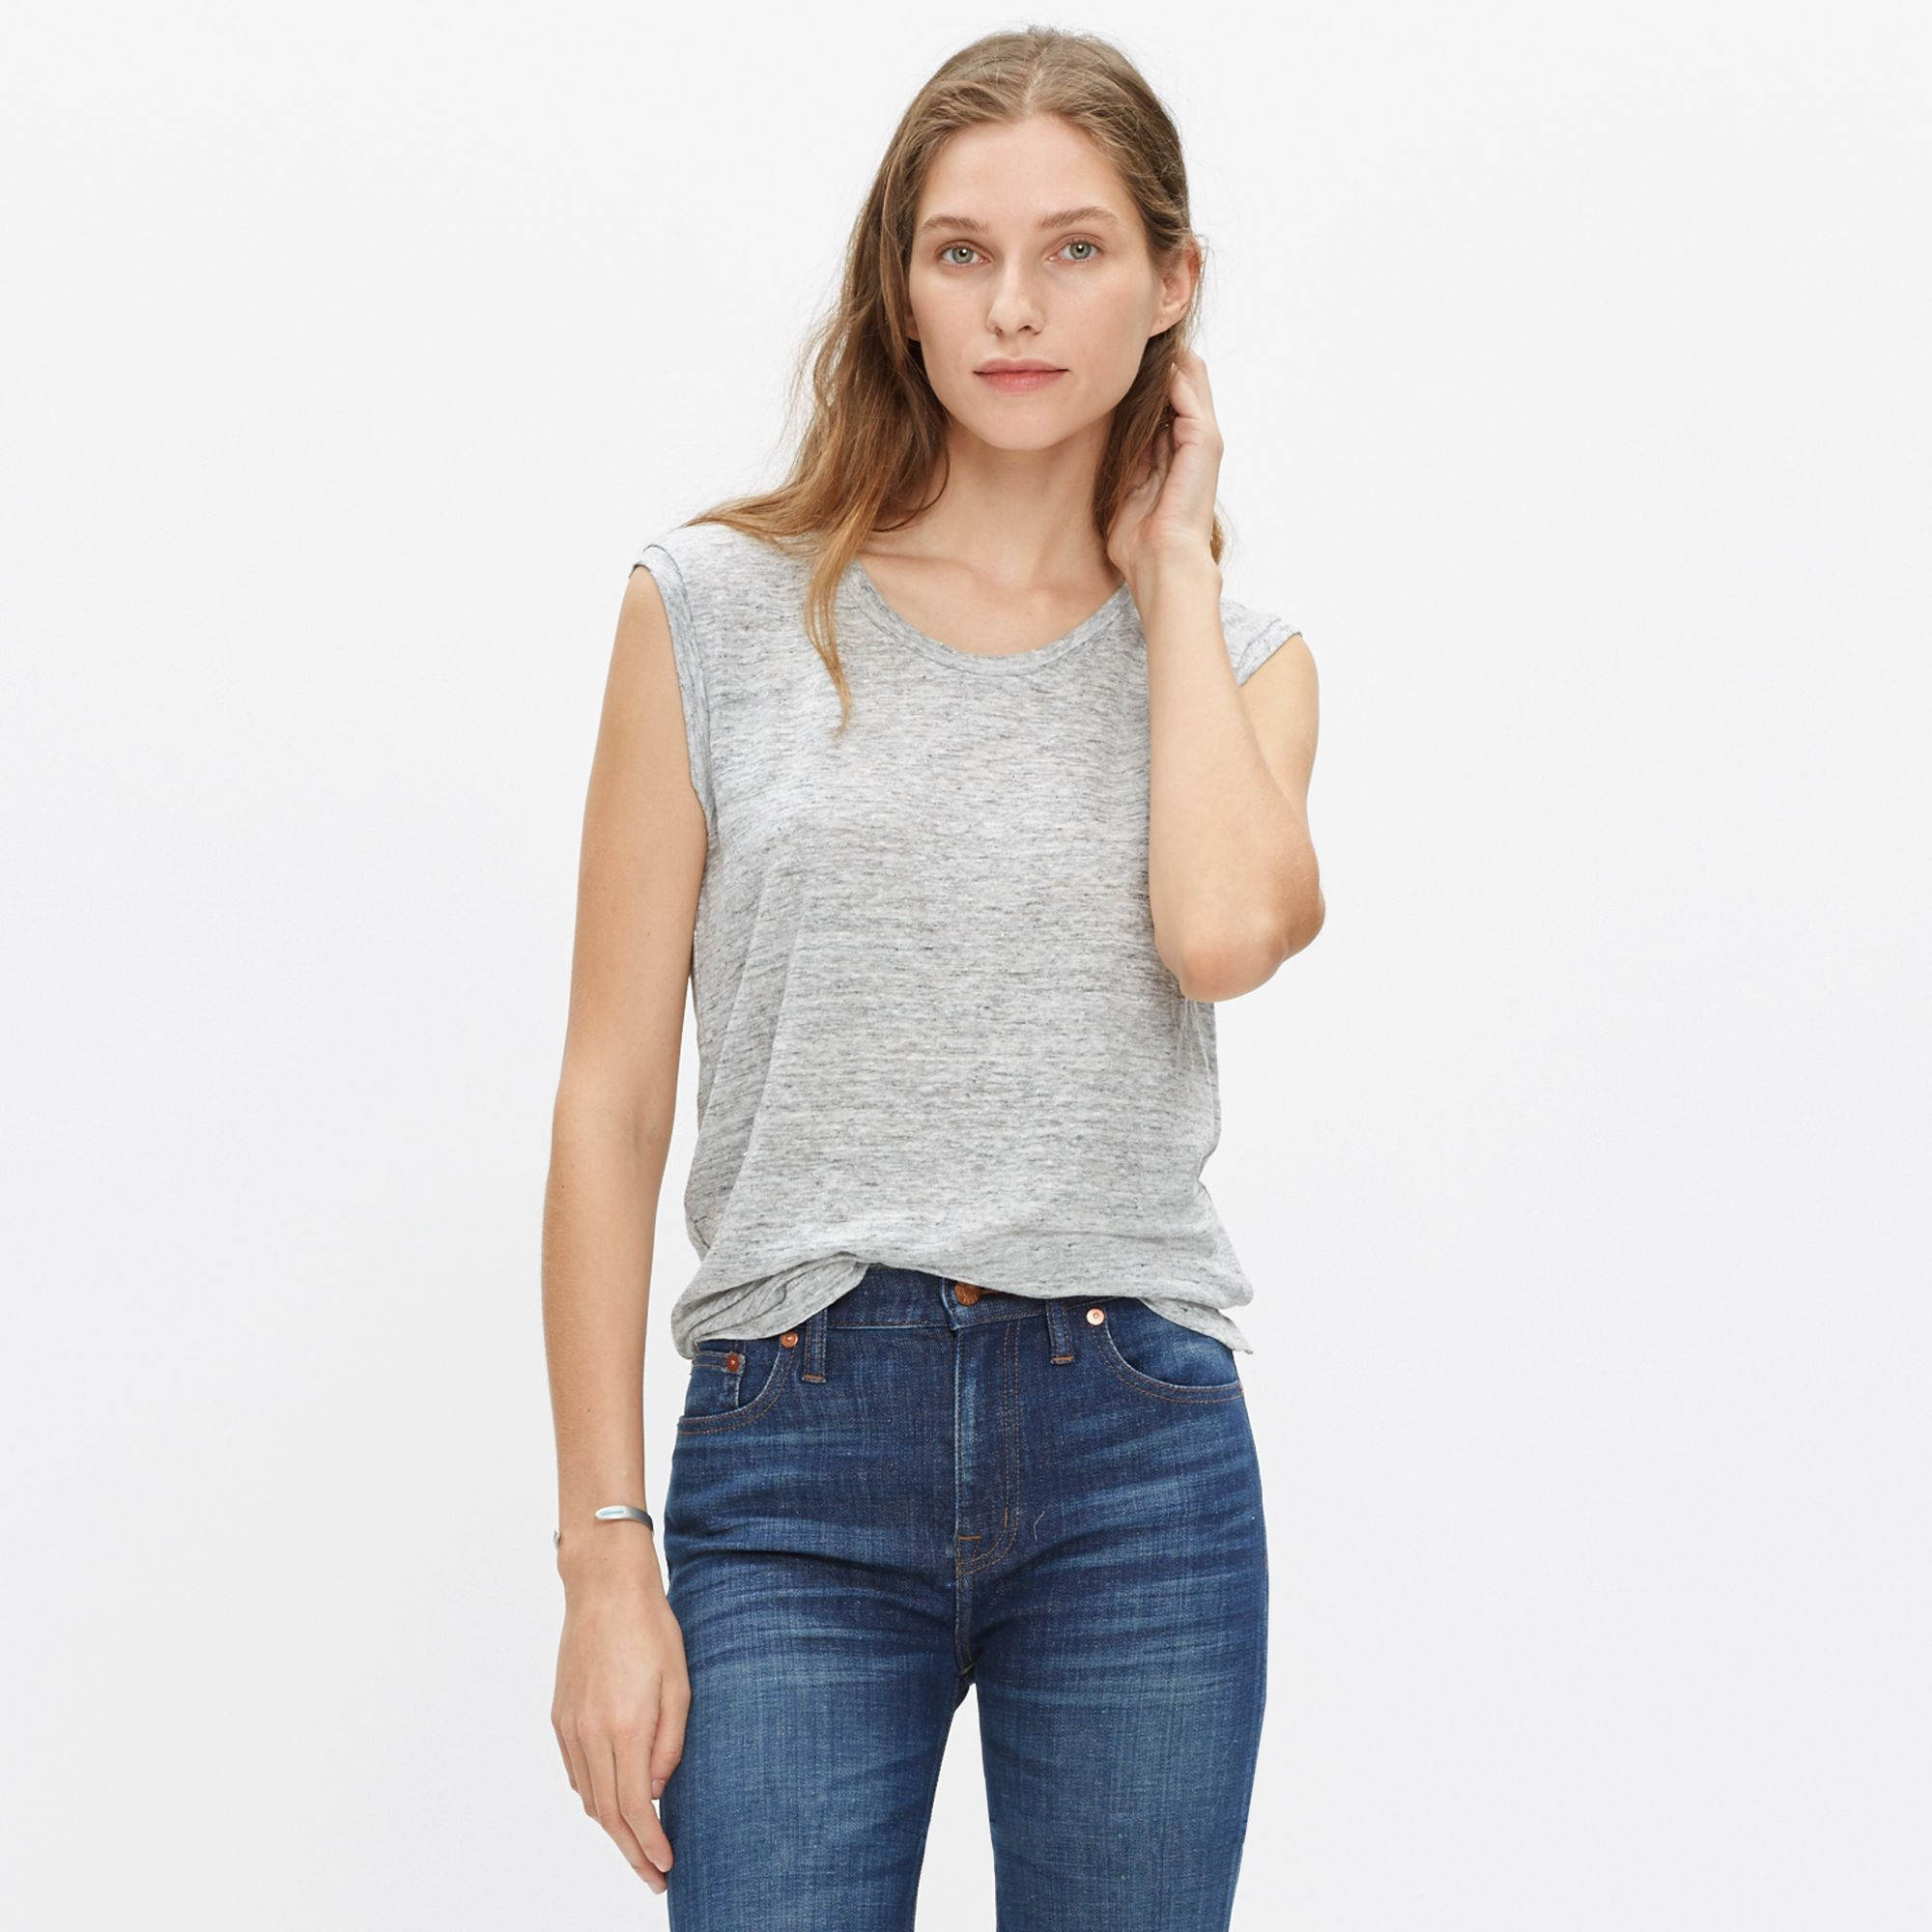 Lyst madewell modern linen heathered muscle tee in metallic for Silver metallic shirt women s